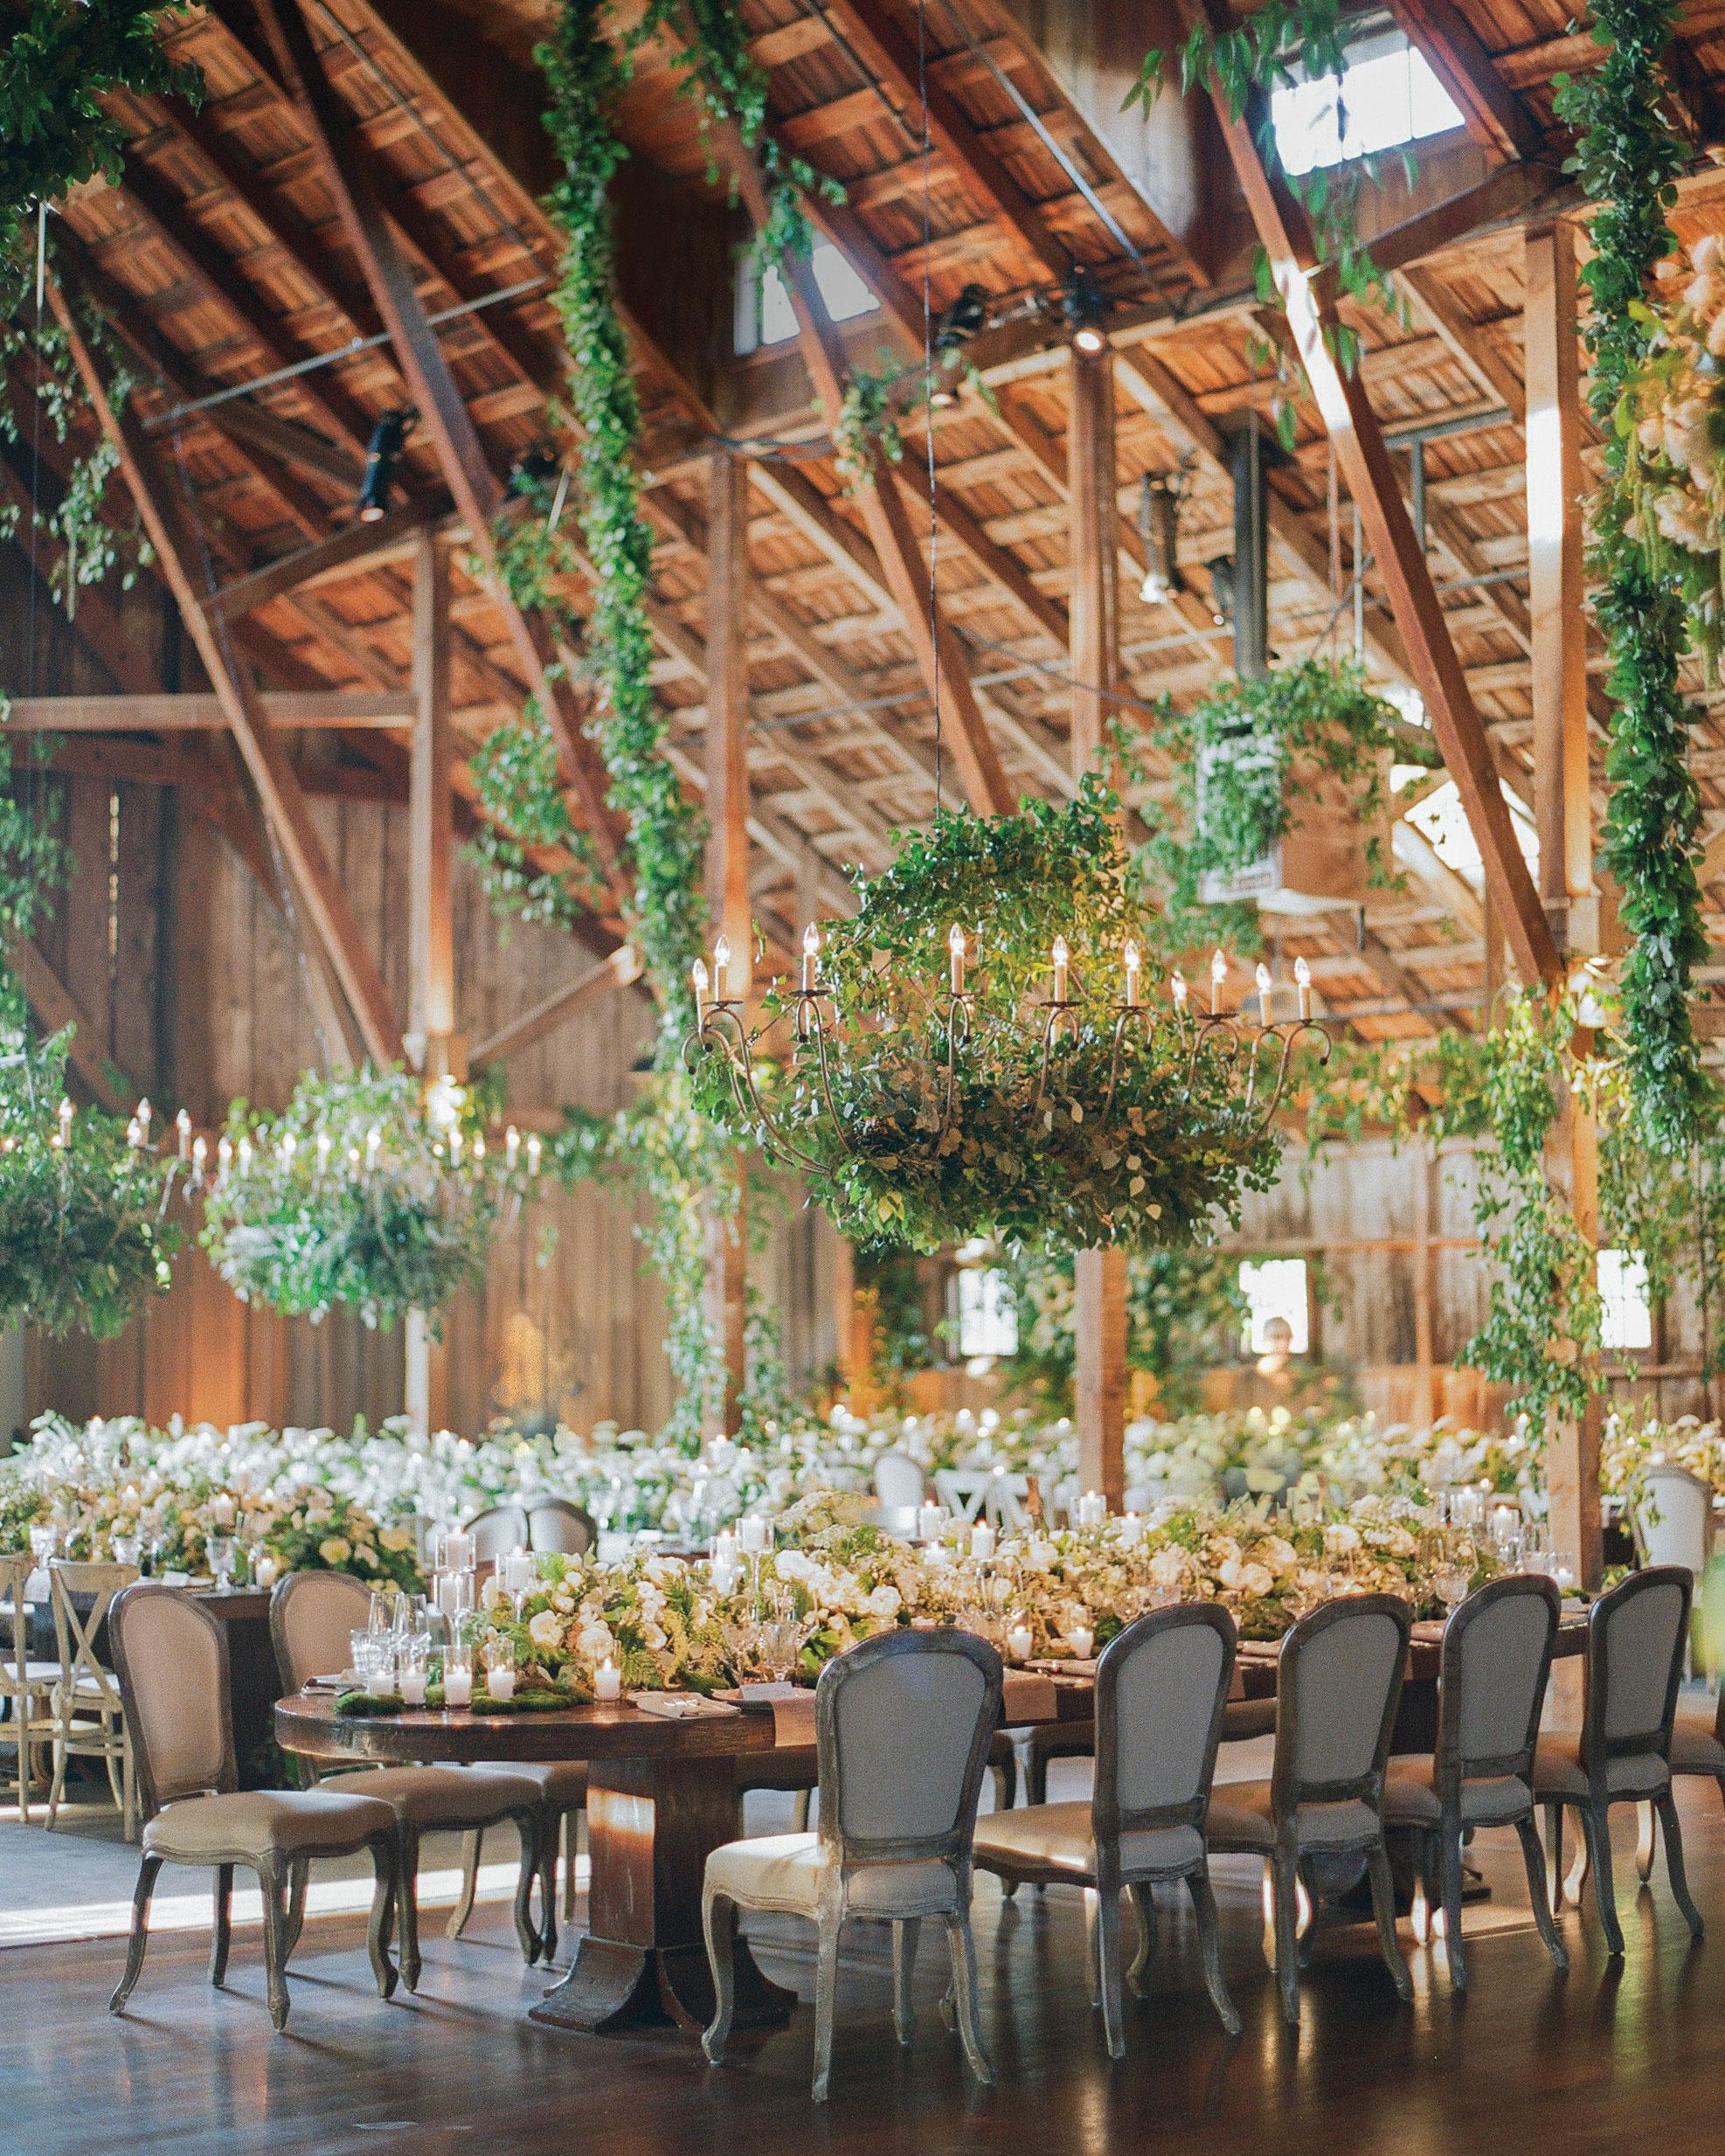 breelayne-hunter-wedding-california-reception-barn-0111-s112849.jpg